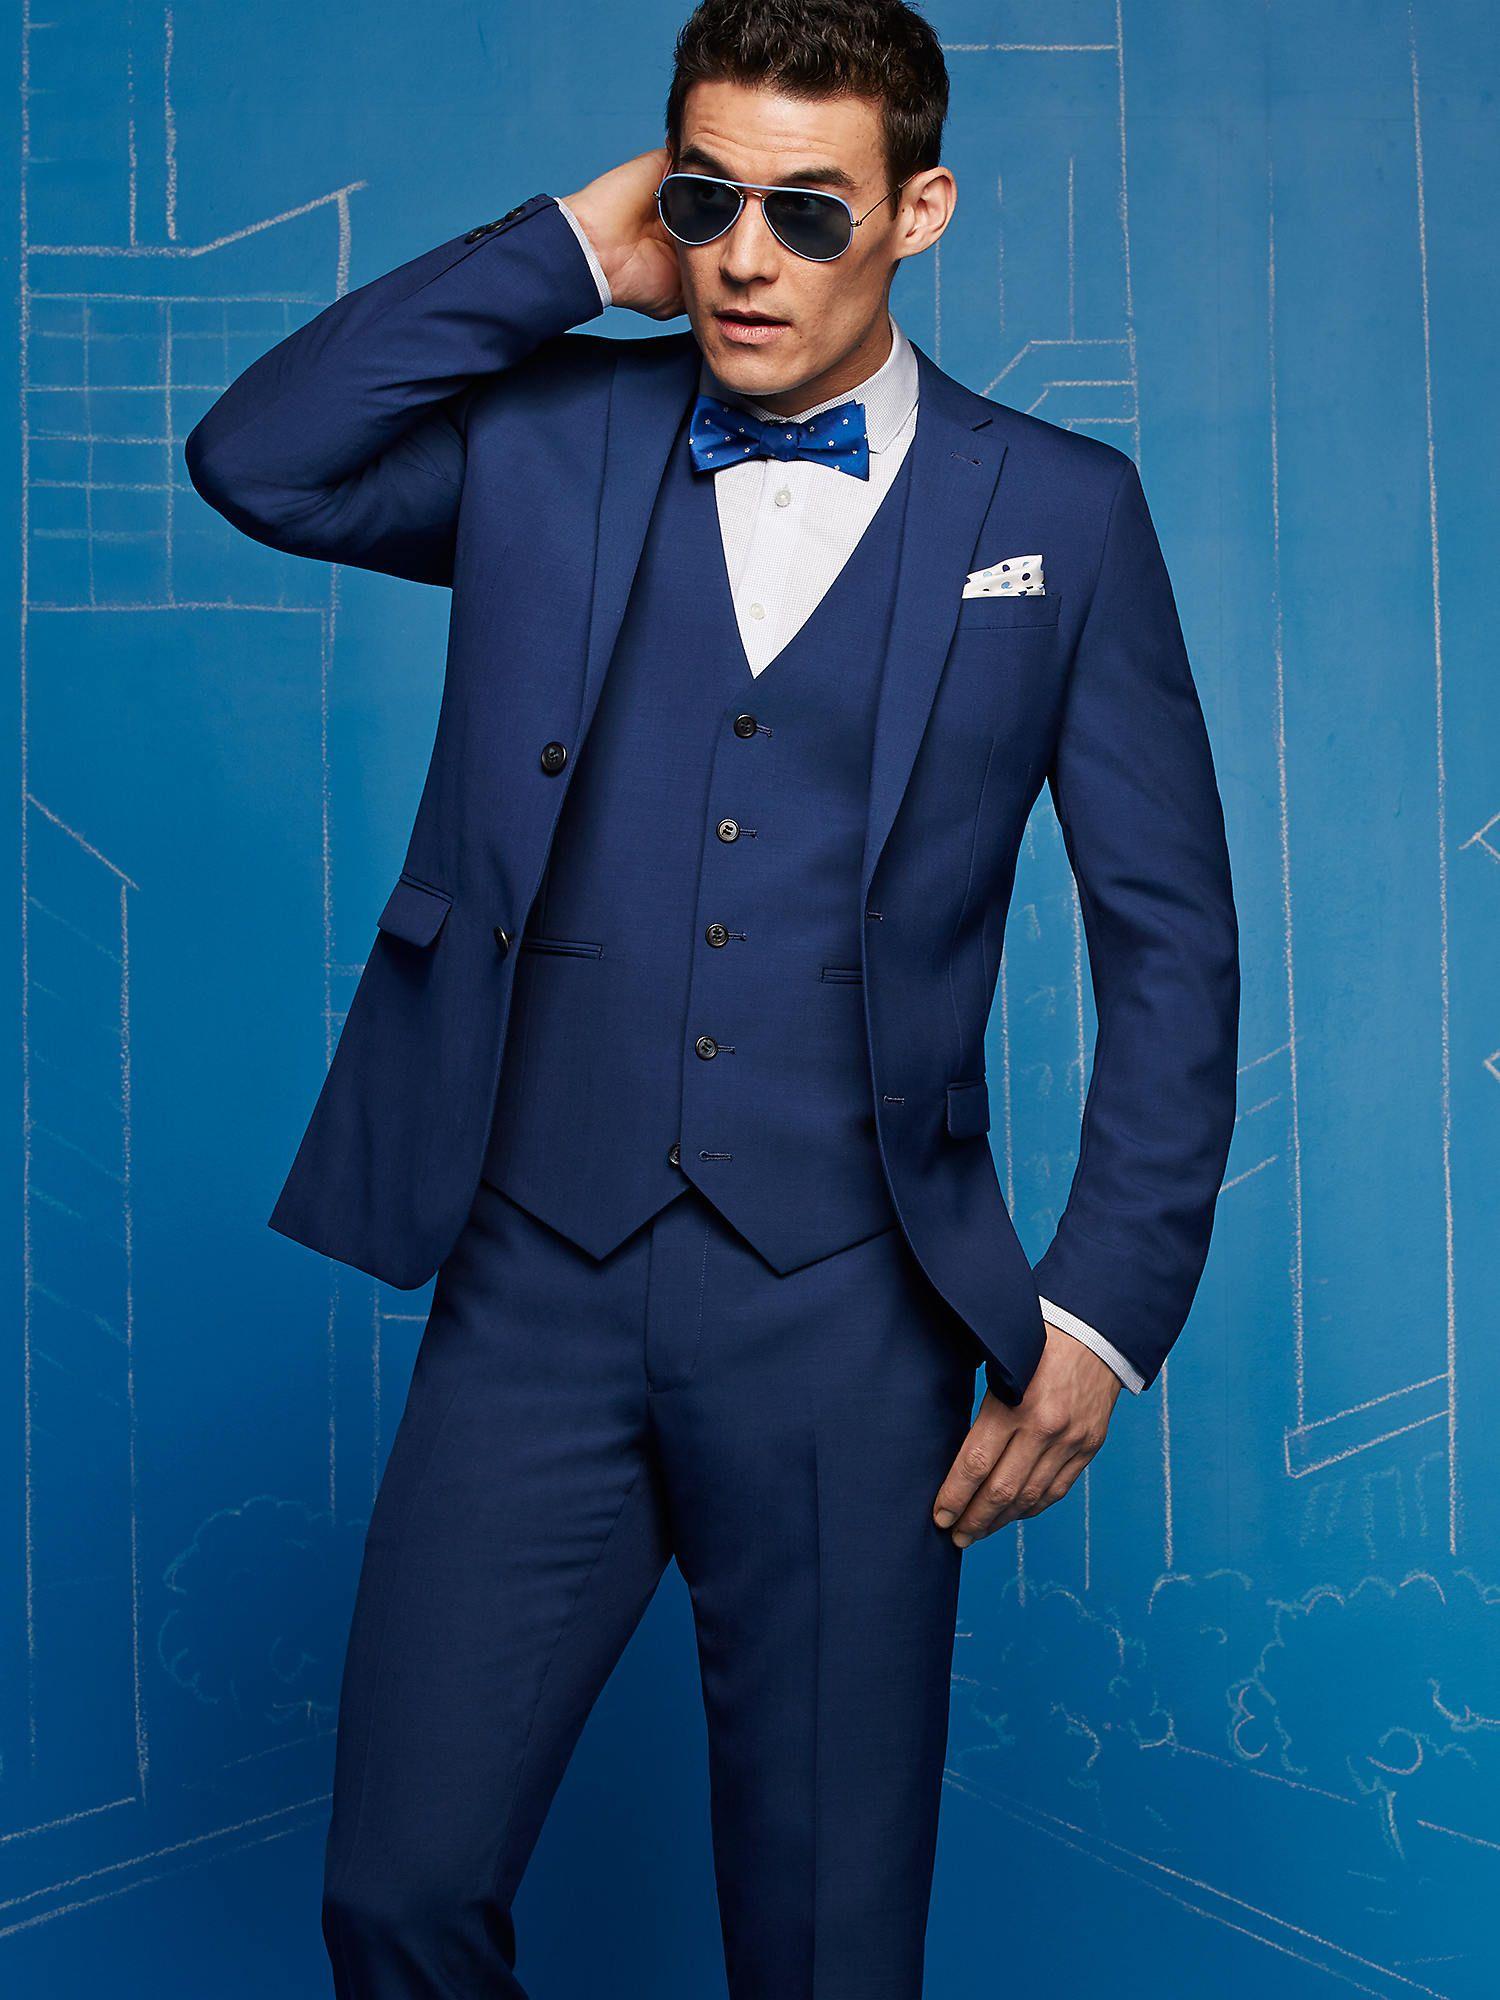 EGARA BLUE VESTED EXTREME SLIM FIT SUIT, Men's Wearhouse